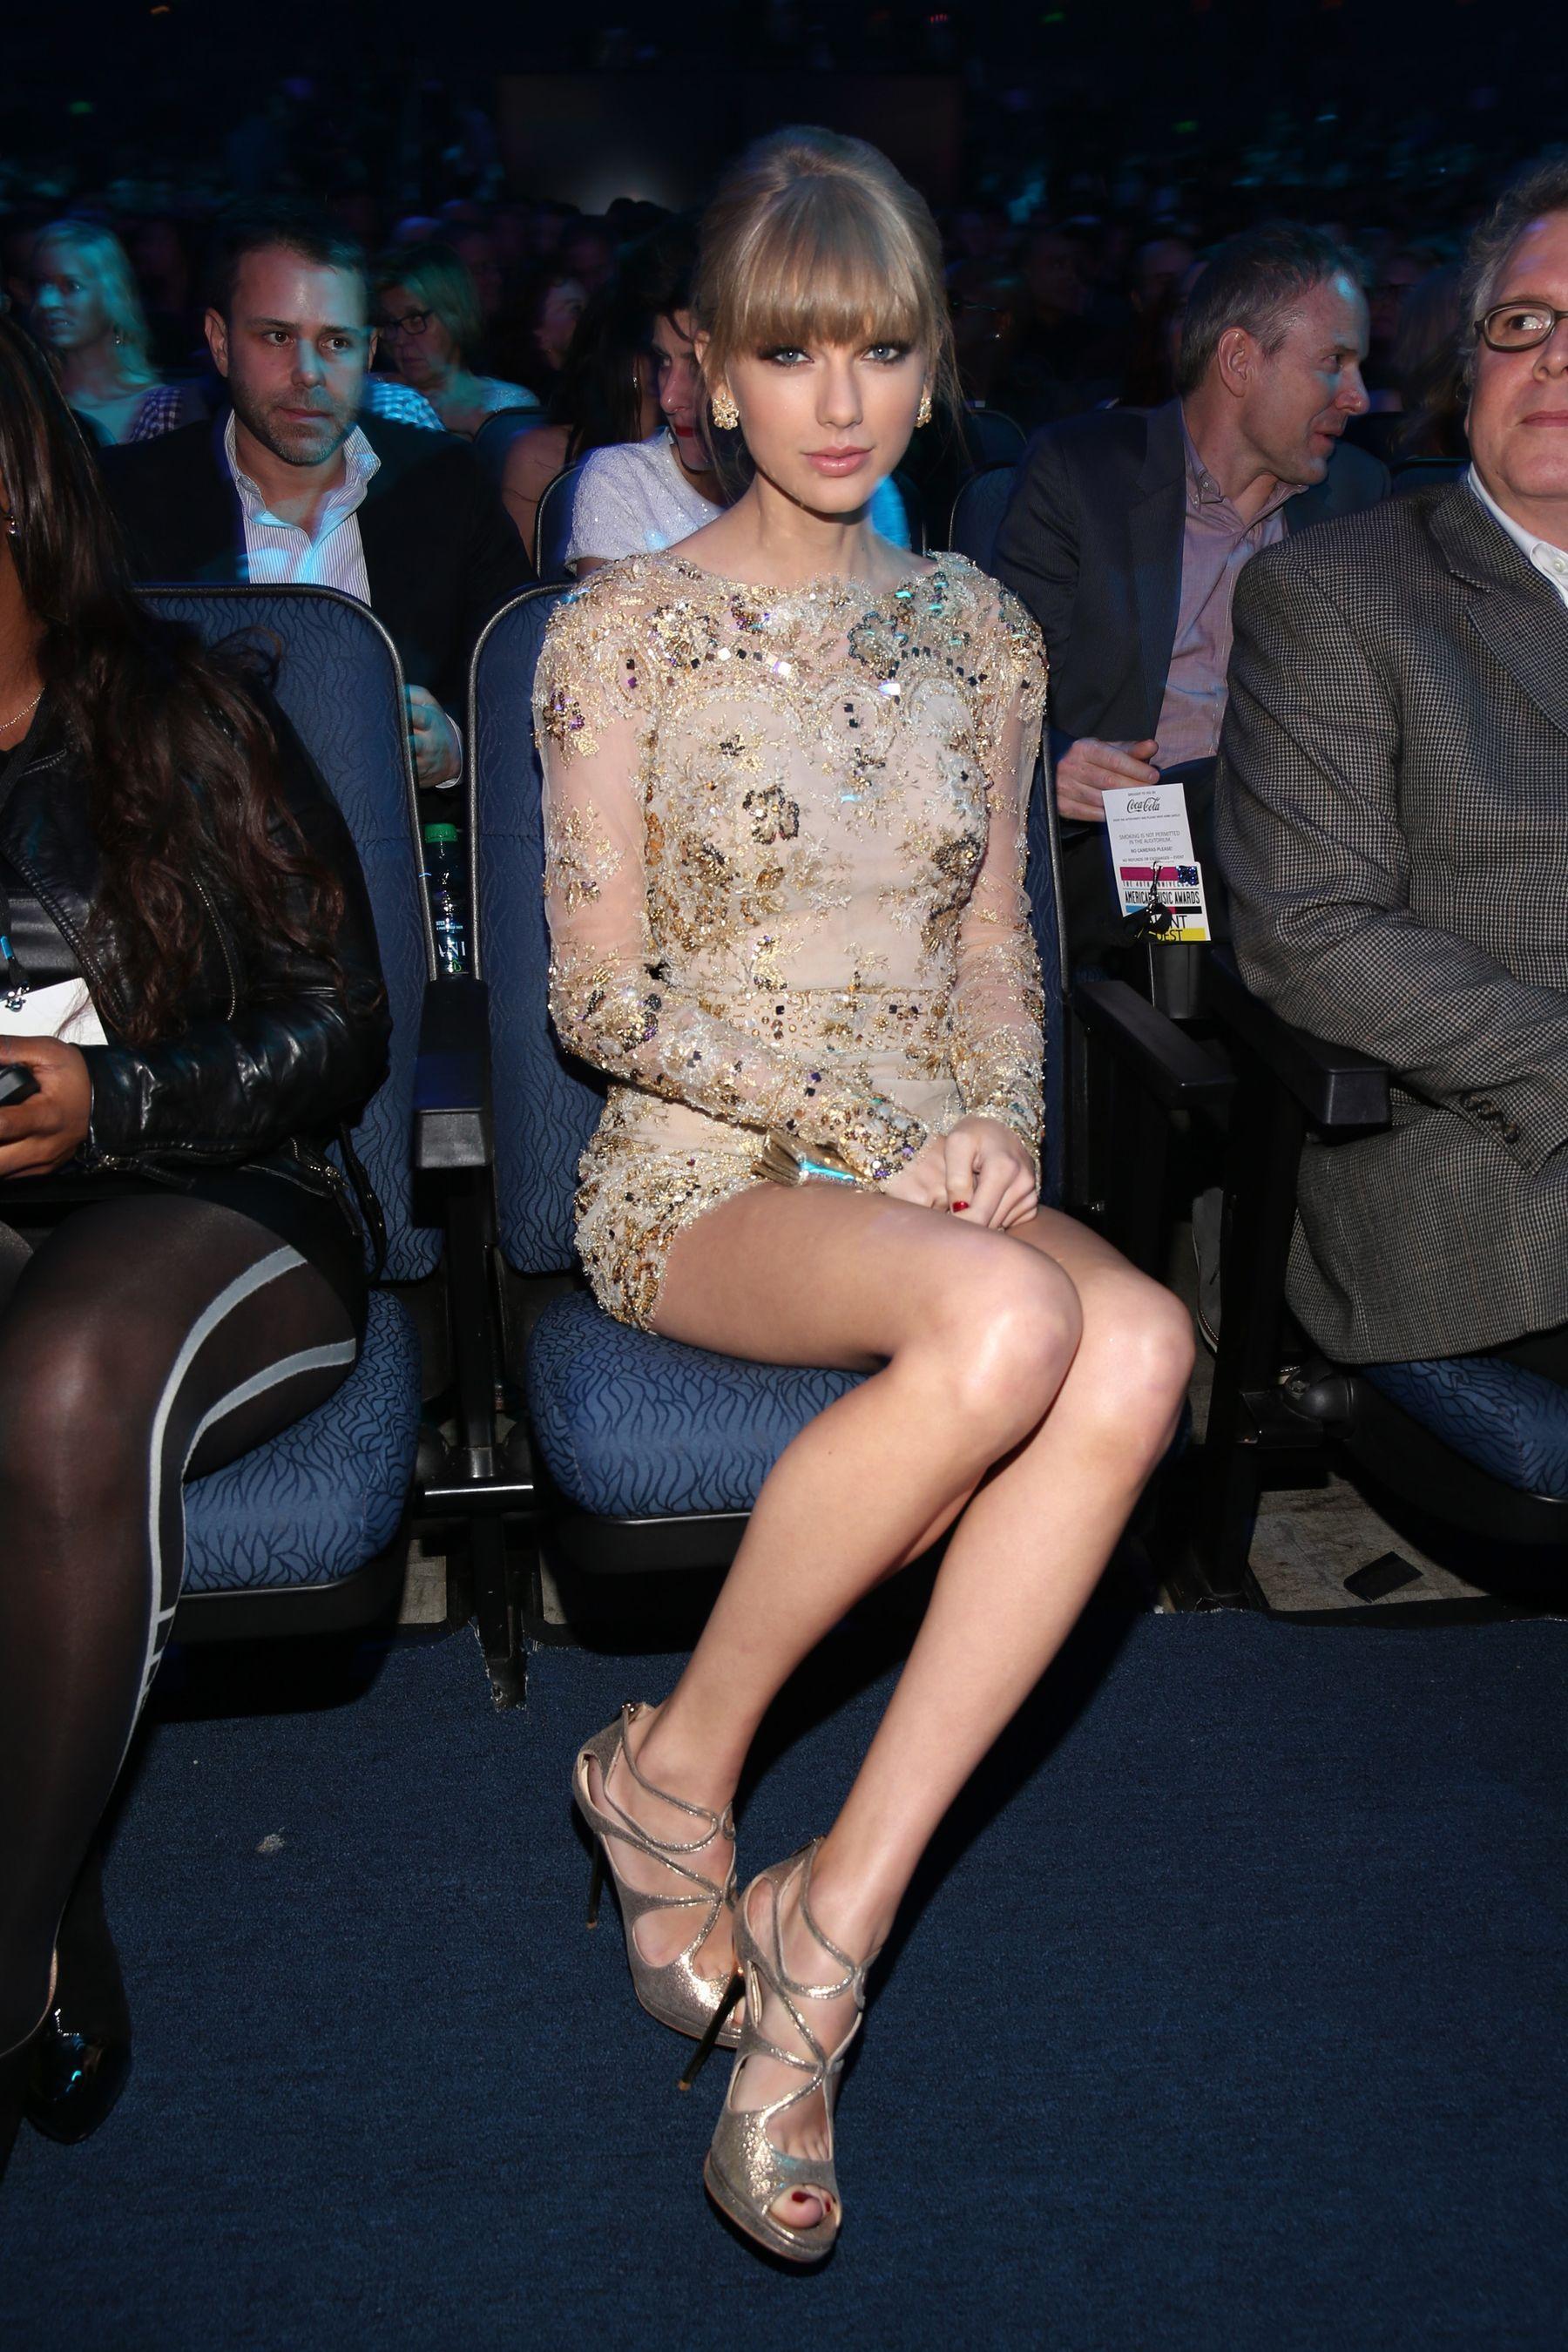 00eb0c3bd1416 16 Times Taylor Swift's Posture Was Nearly Inhuman   Shine bright ...